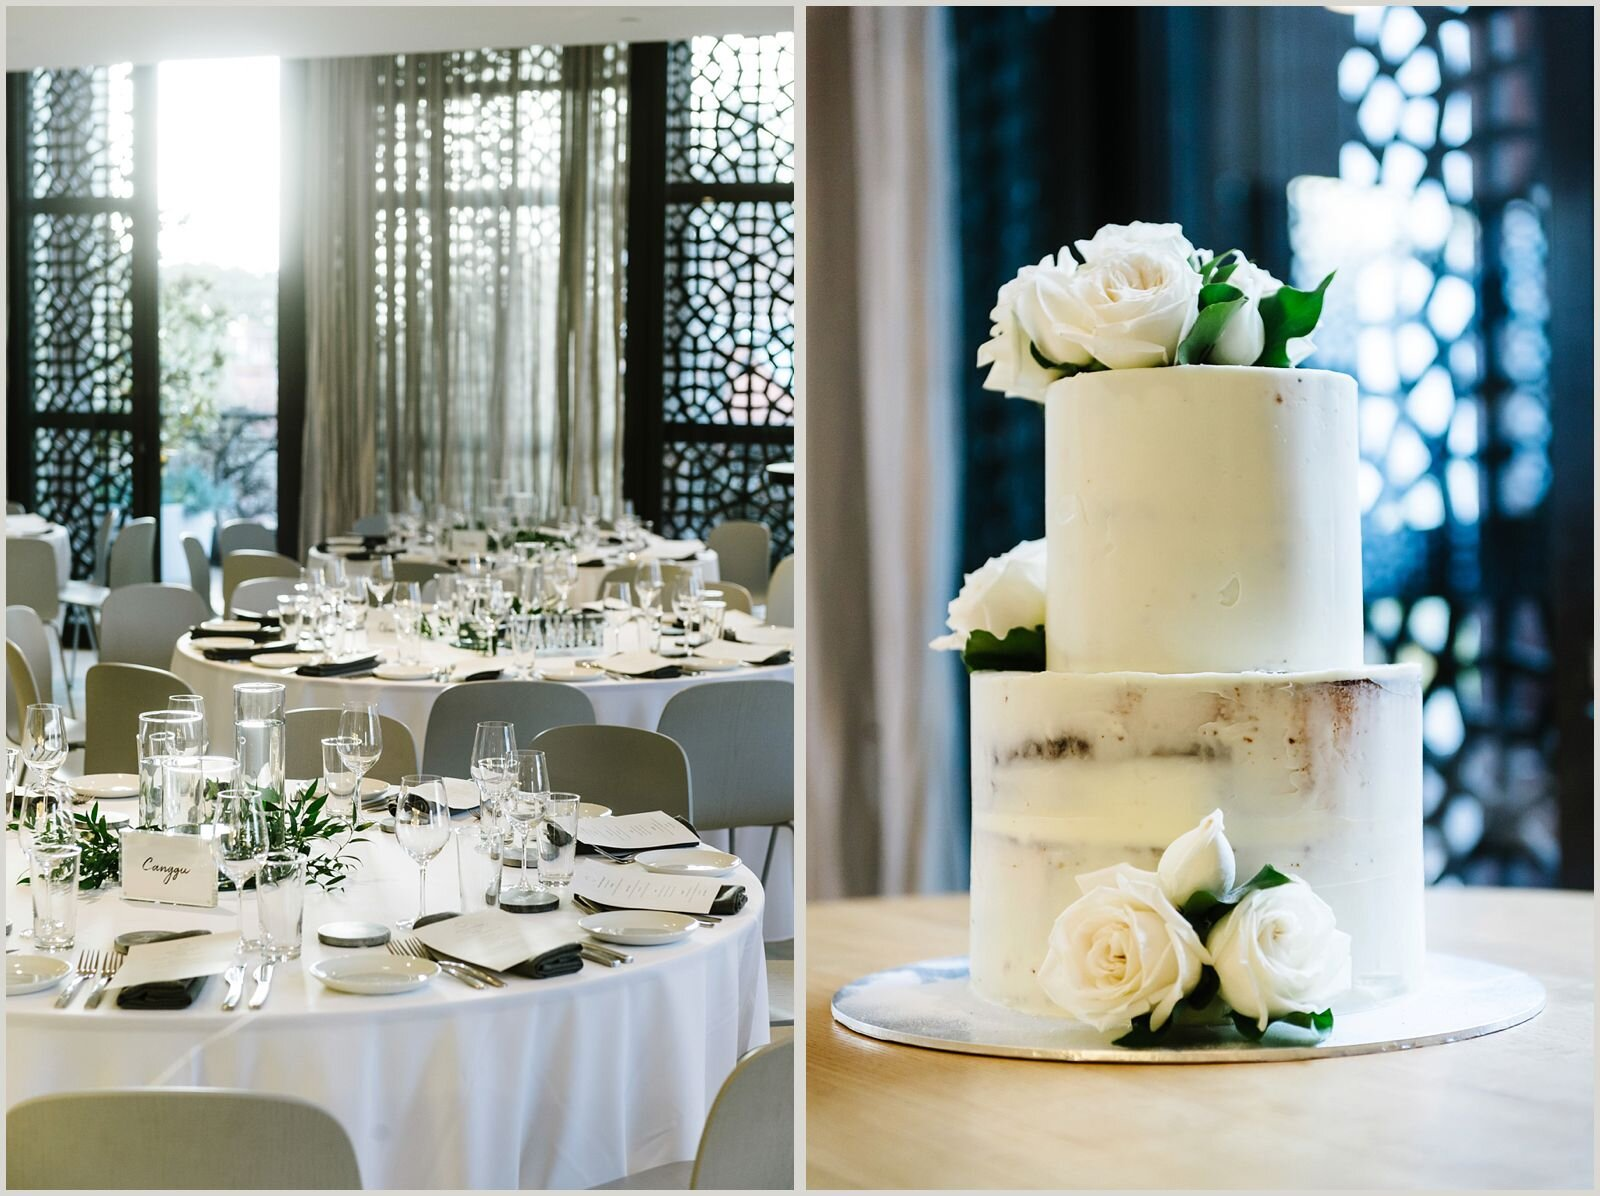 joseph_koprek_wedding_melbourne_the_prince_deck_0071.jpg